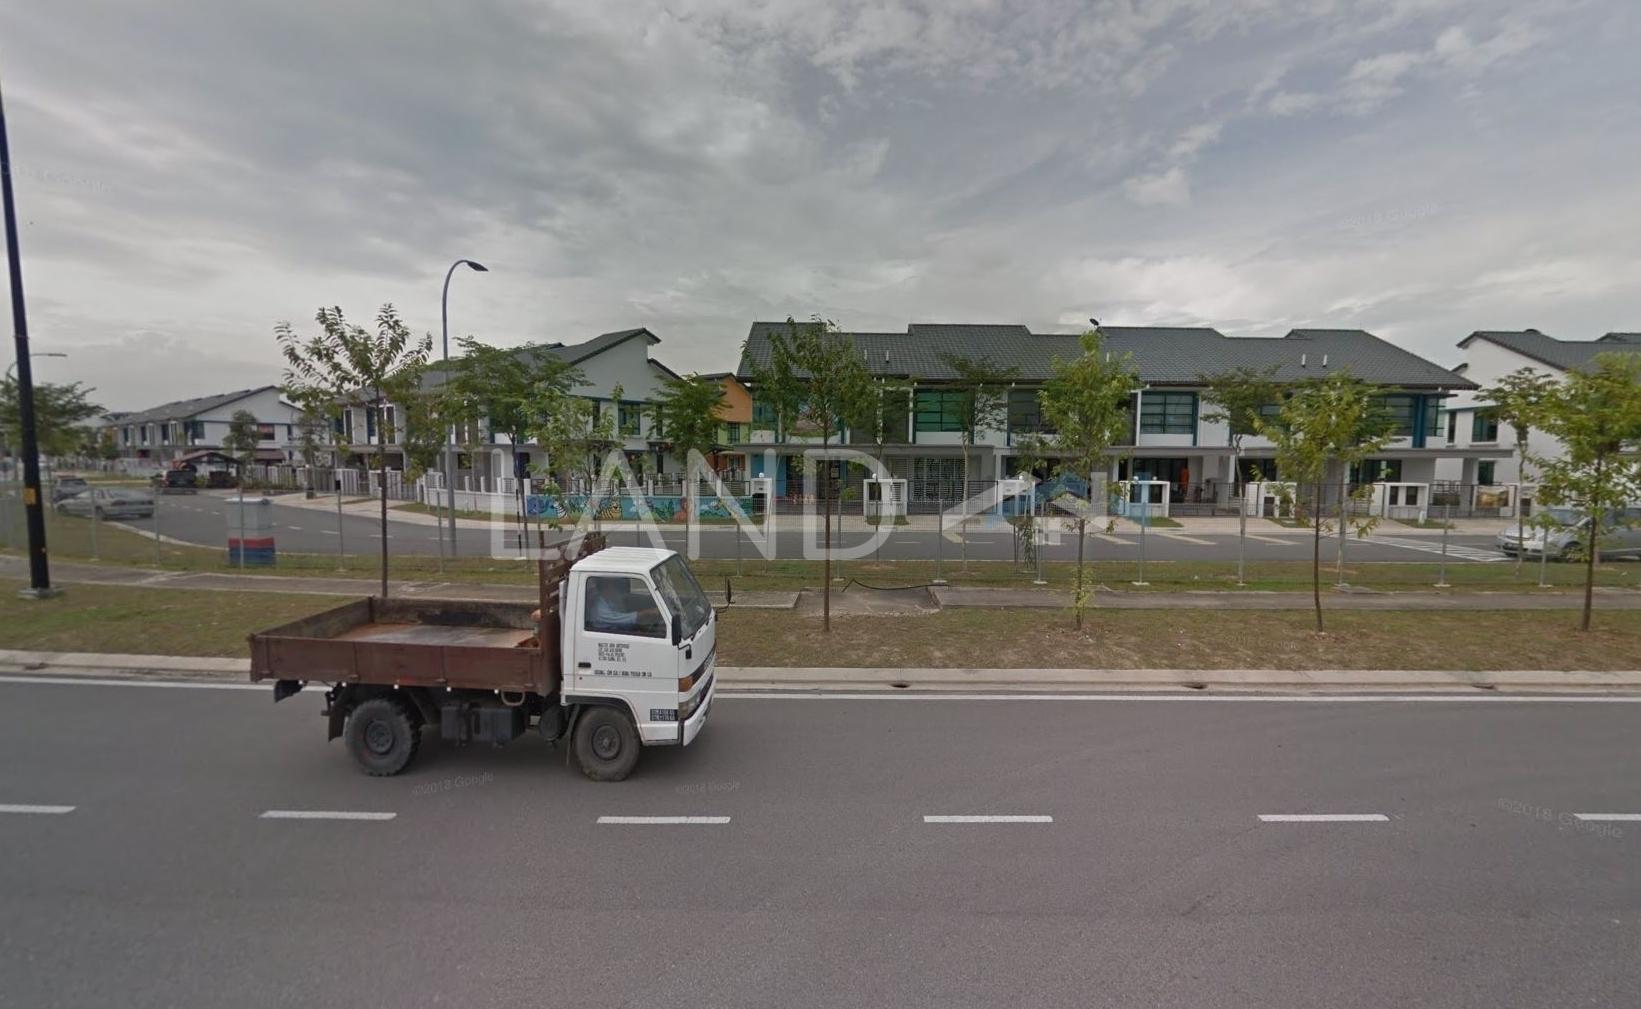 Unfurnished Terrace For Sale At Nafiri, Bandar Bukit Raja ...